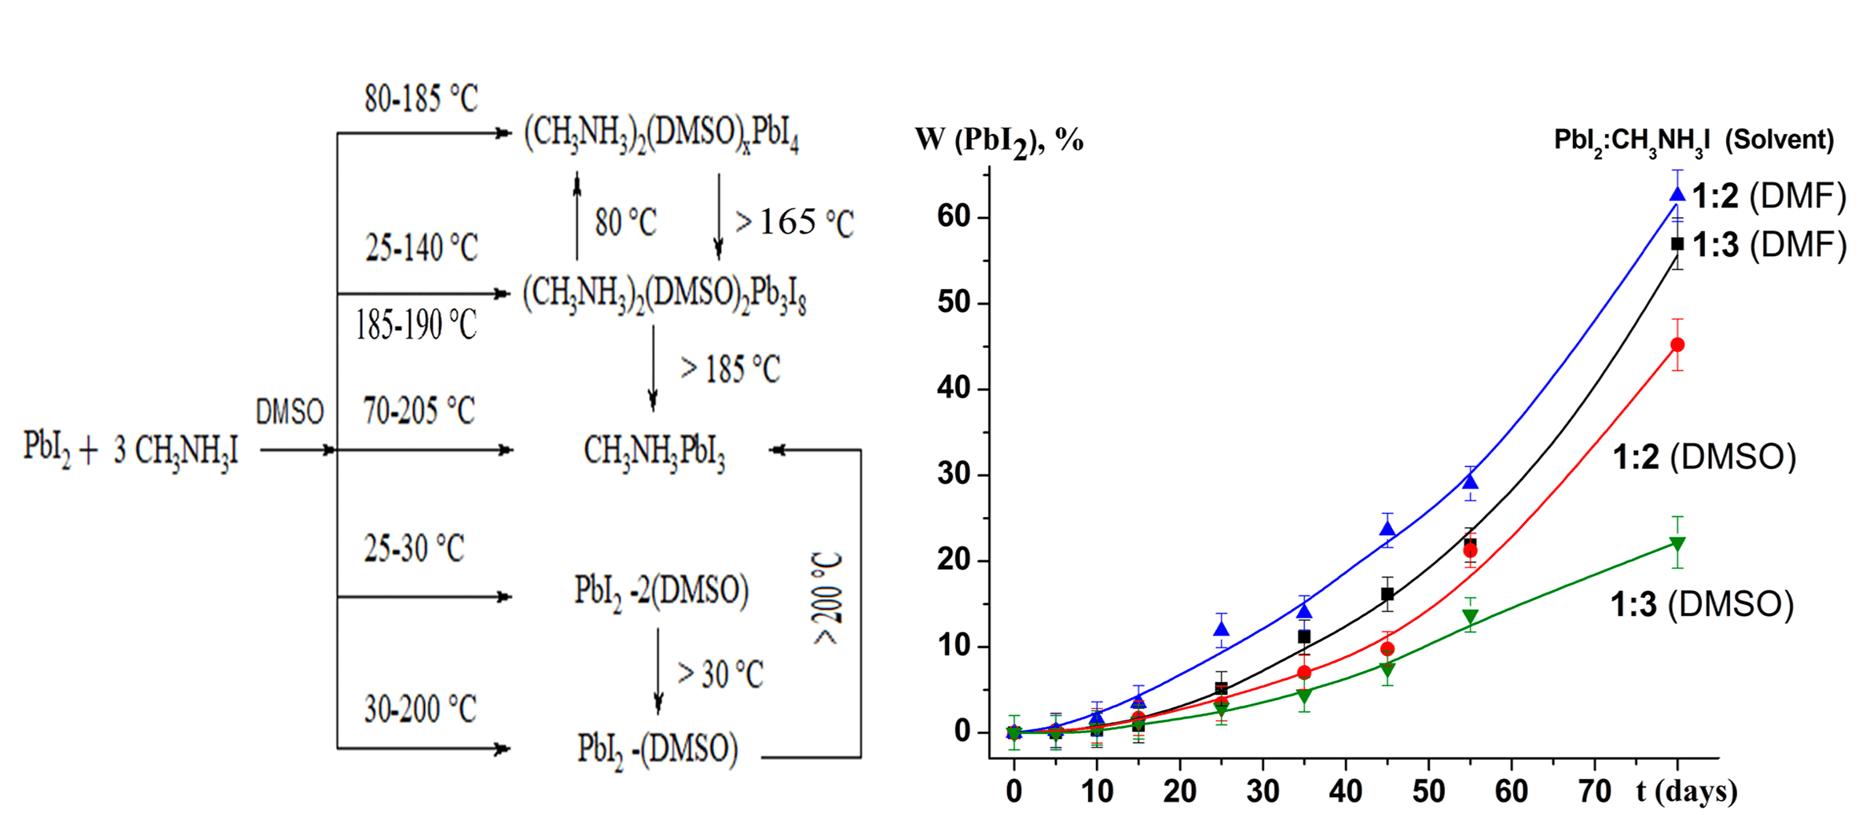 Synthesis of Organic-Inorganic Perovskite CH3NH3PbI3 using Dimethyl Sulfoxide (DMSO) Solvent